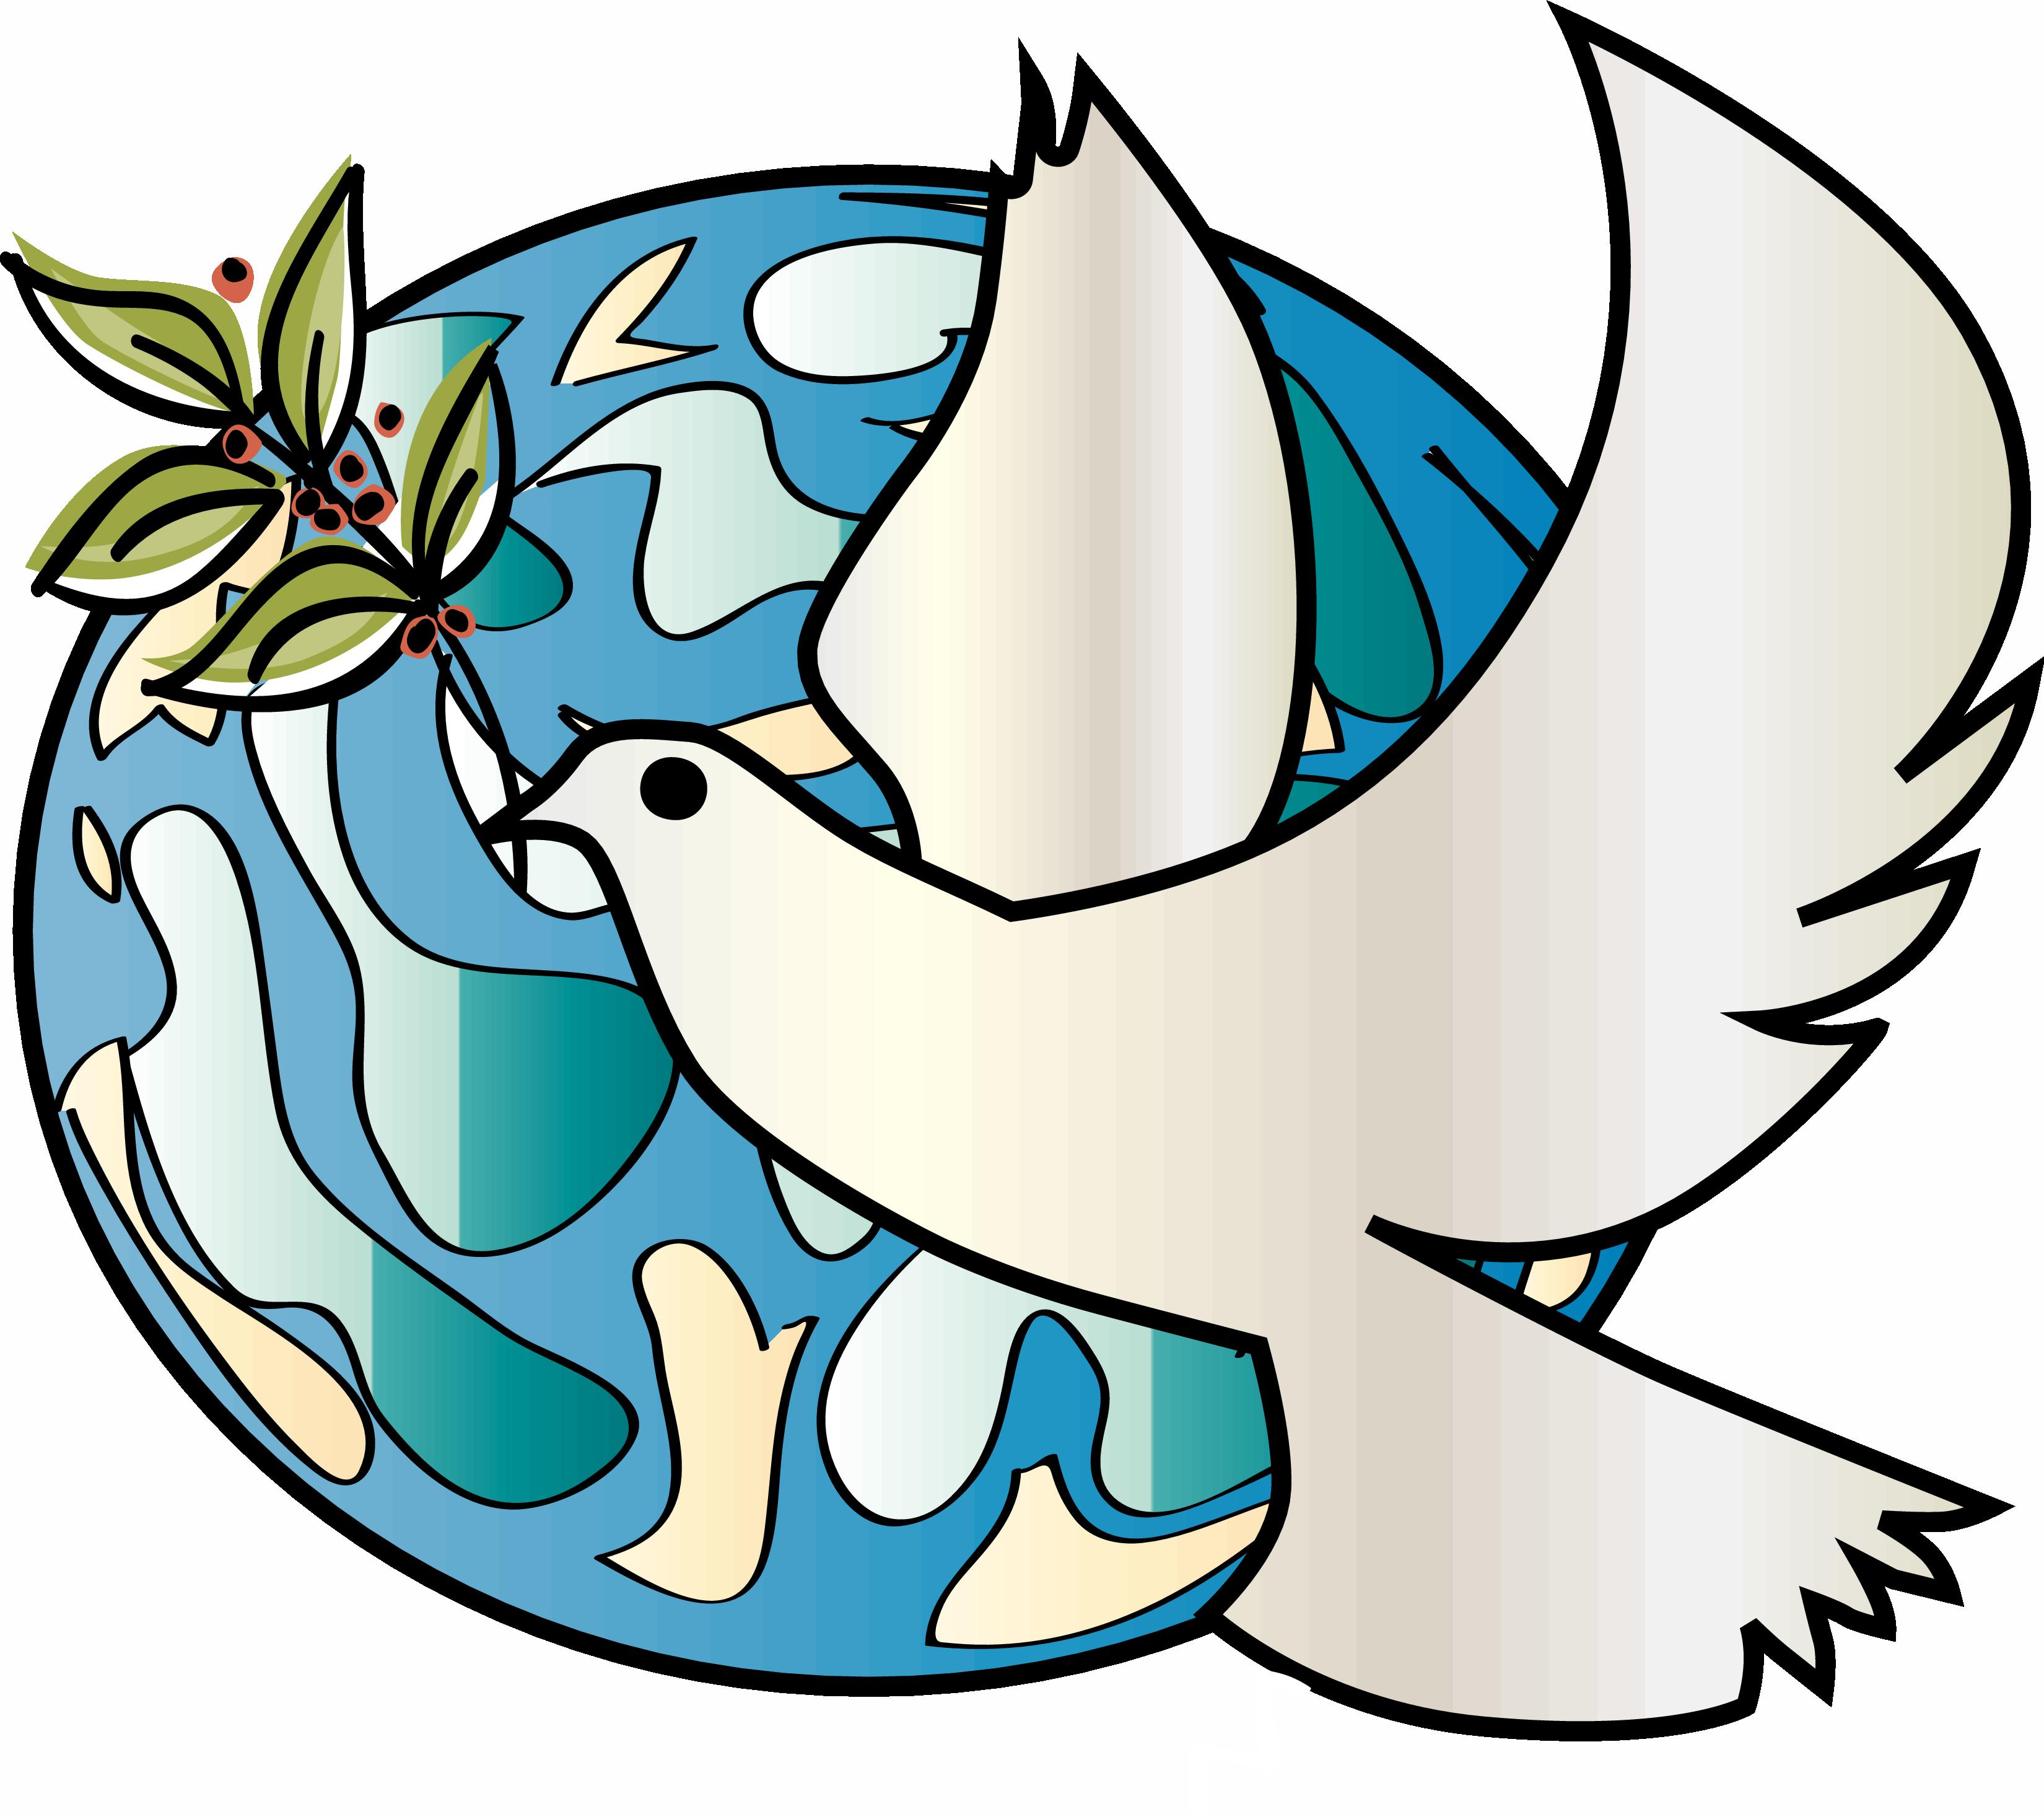 Bulletin free on dumielauxepices. Peace clipart dove